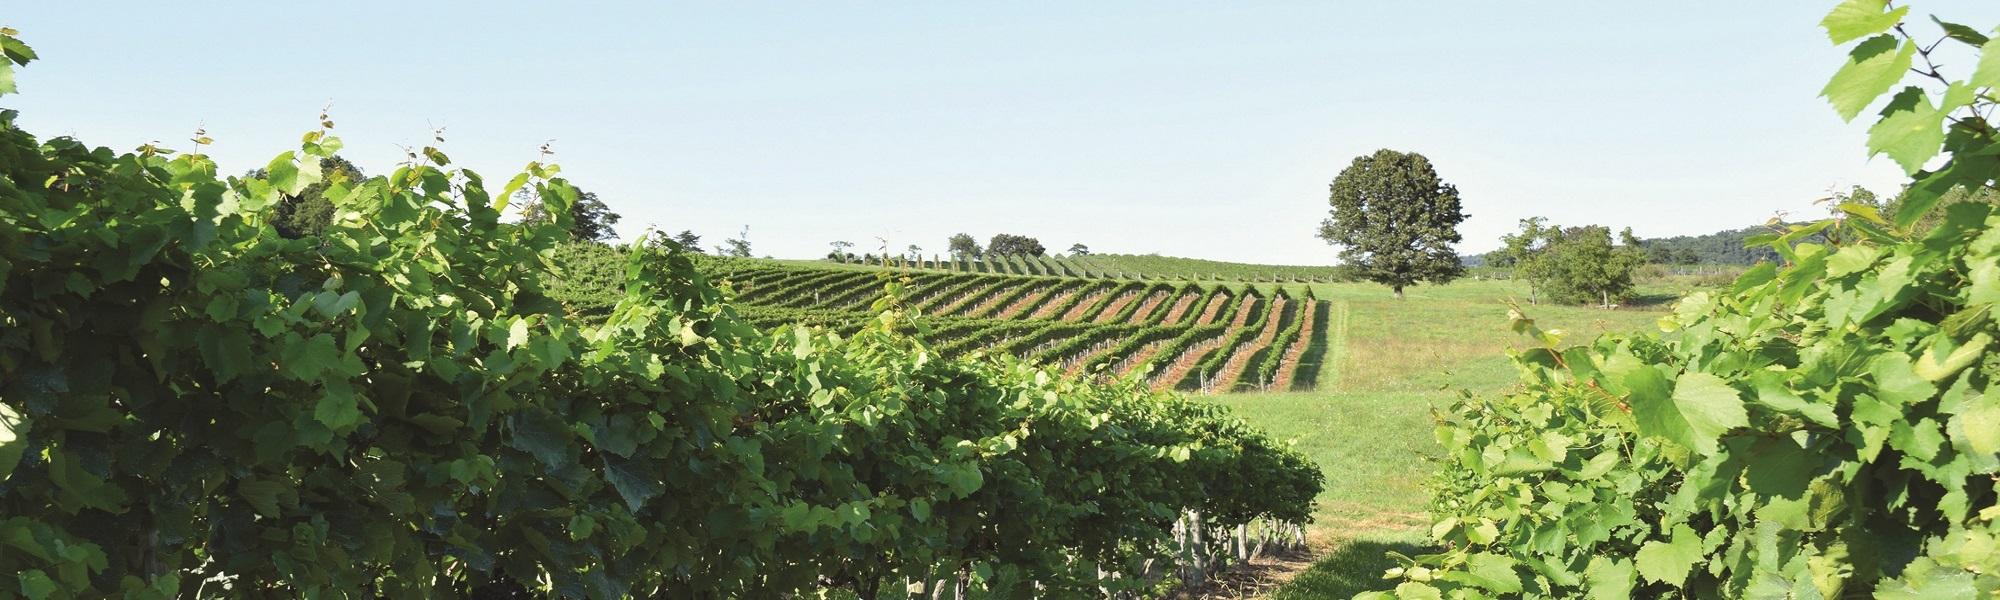 Shenendoah Valley Winery - Vineyard 2